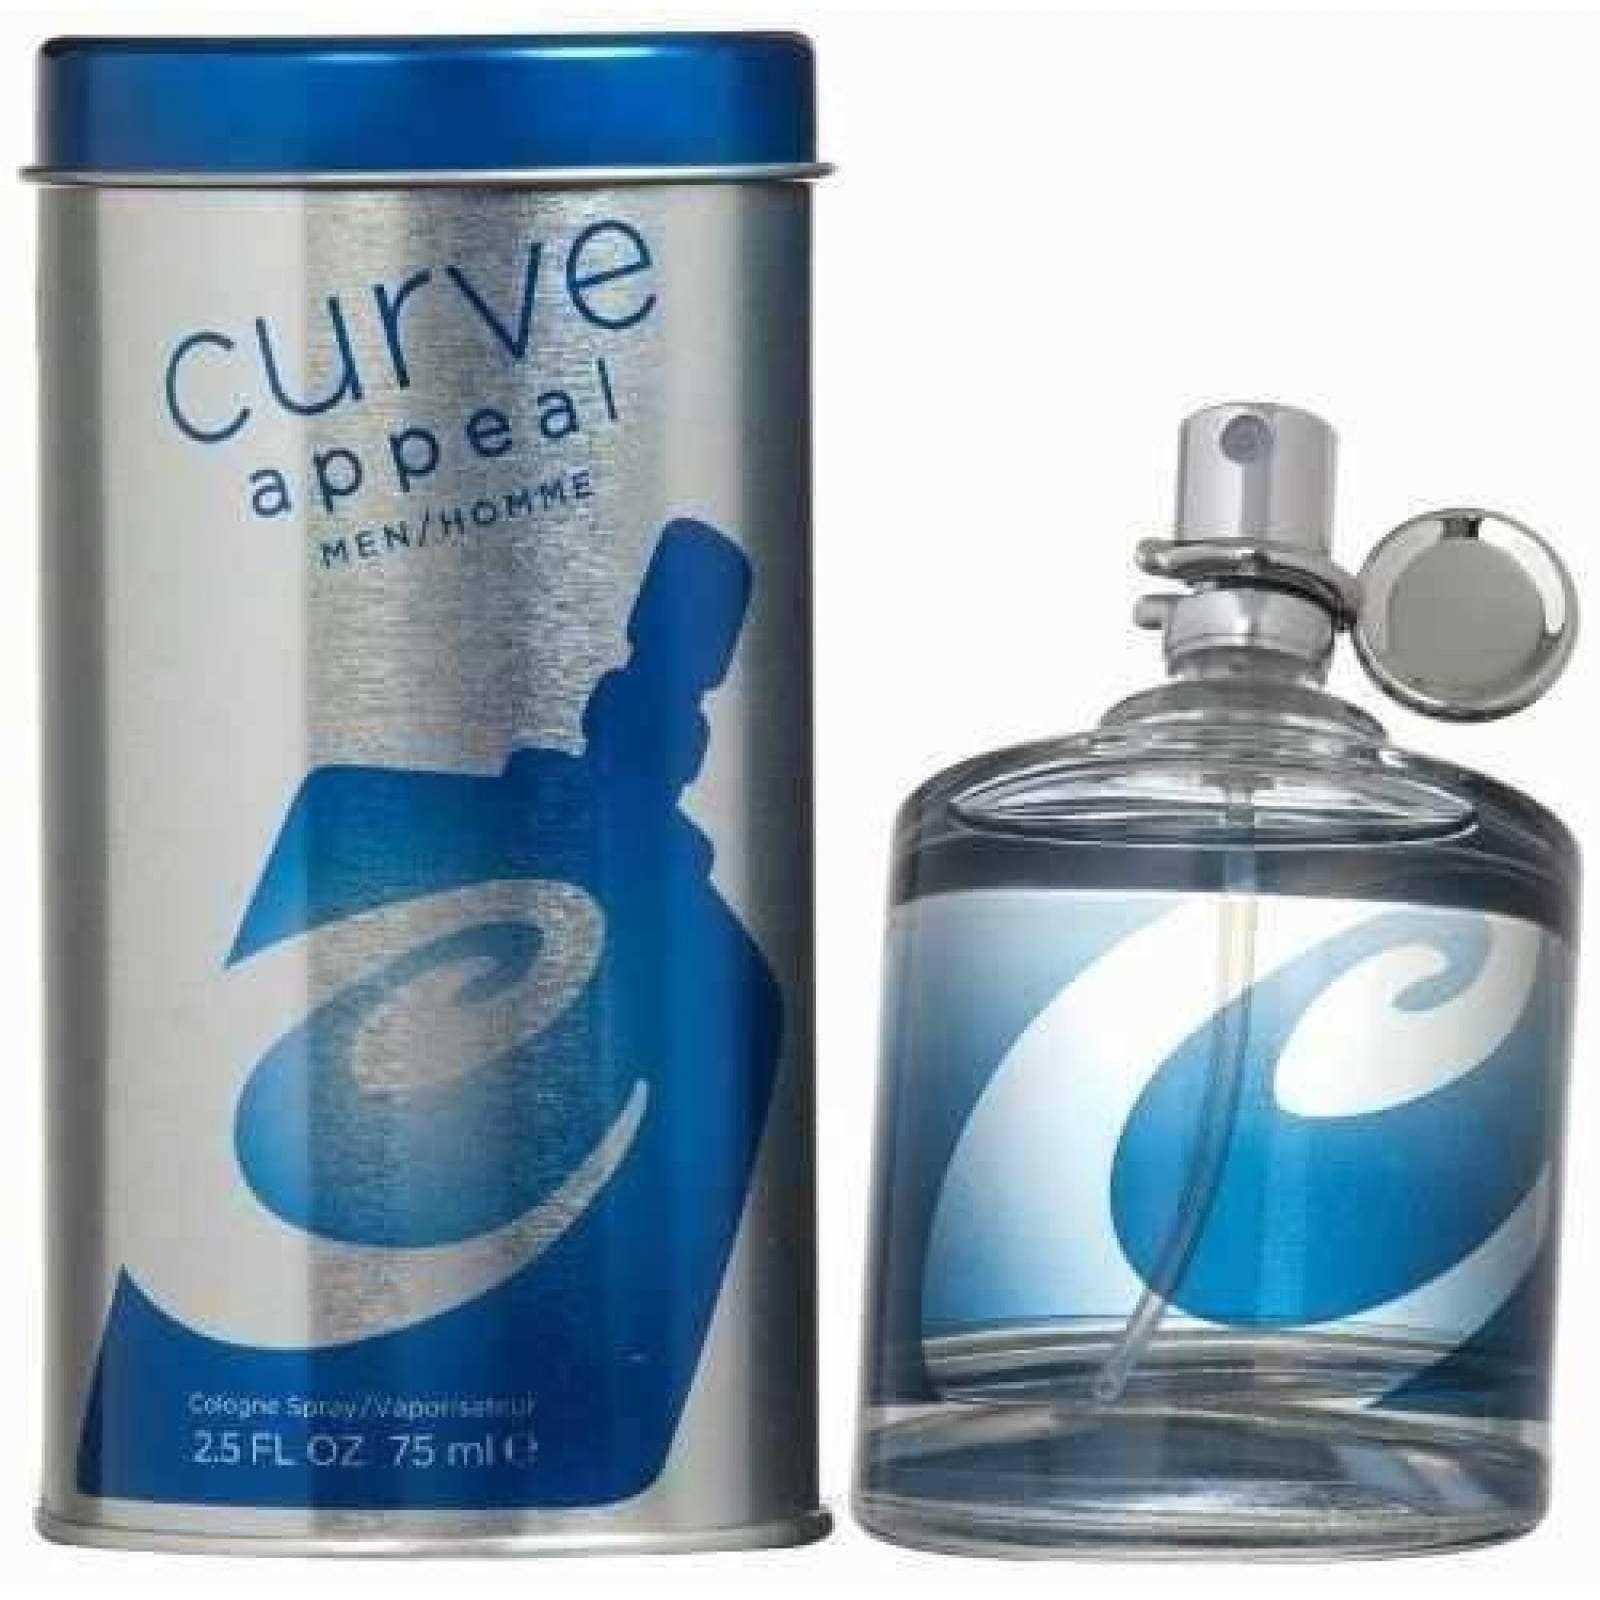 Curve Appeal Caballero 75 Ml Liz Claiborne Edt Spray